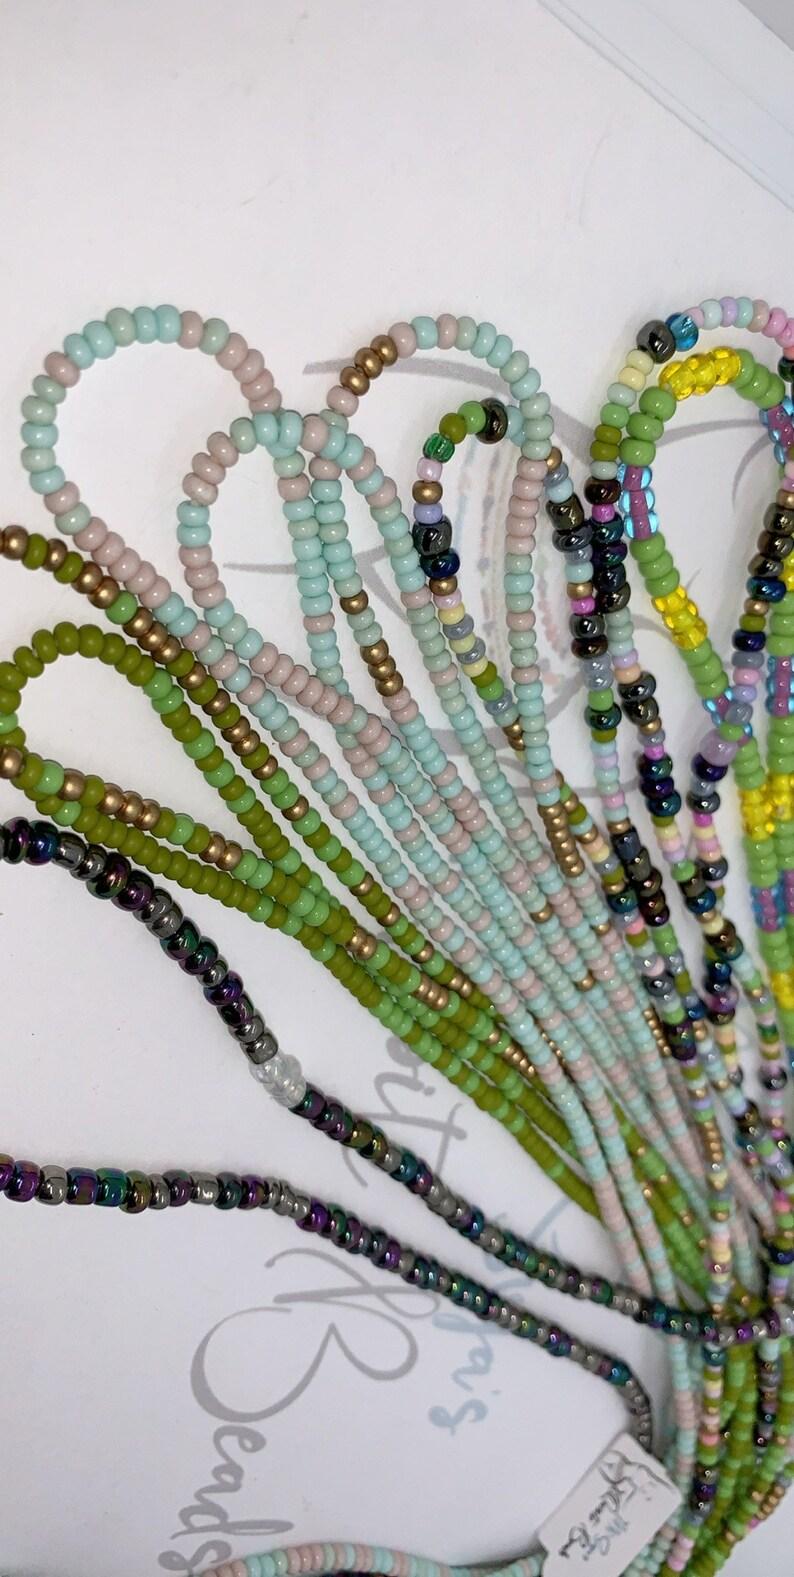 Waist beads